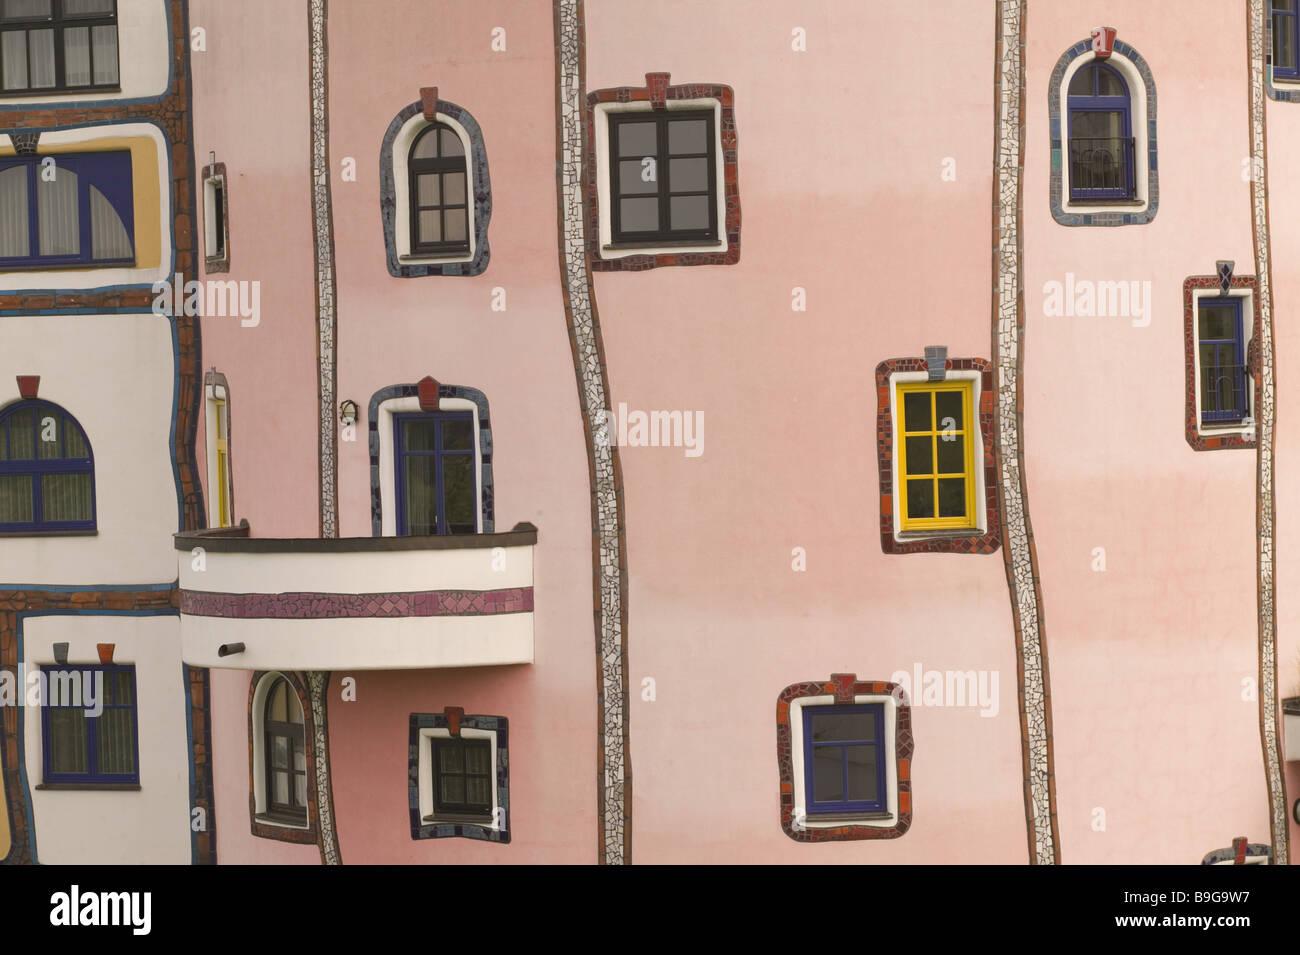 Austria Styria Bad Blumau Rogner Bad Design Hotel Facade Detail  Hundertwasser Stil No